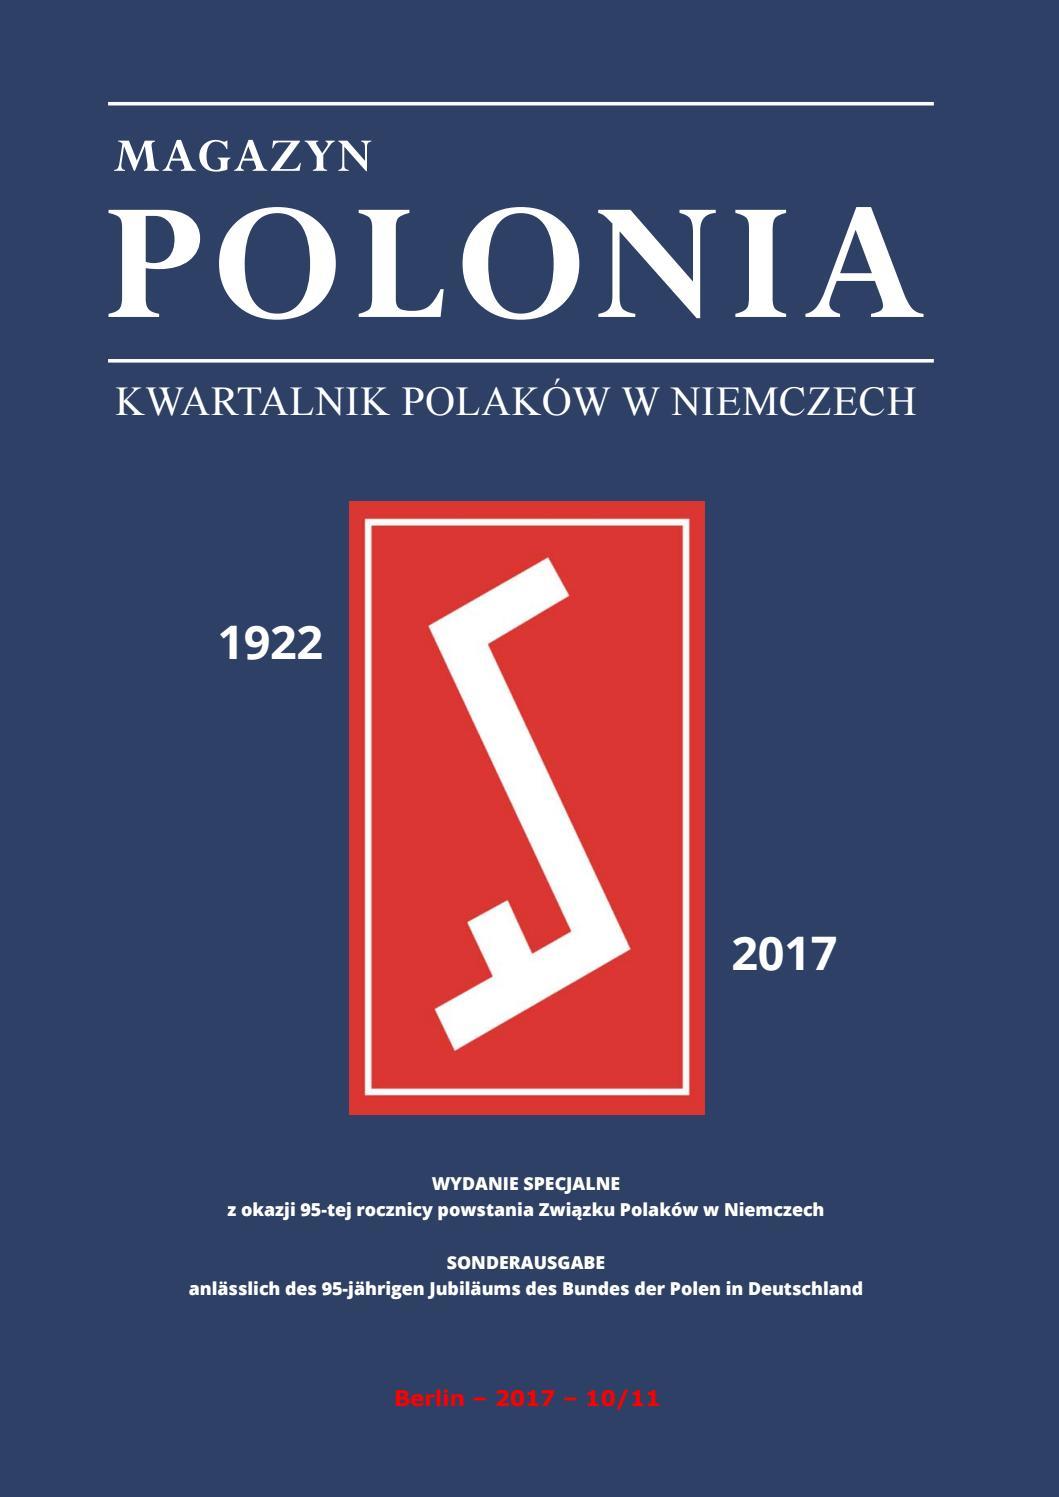 My polacy munchen ogloszenia